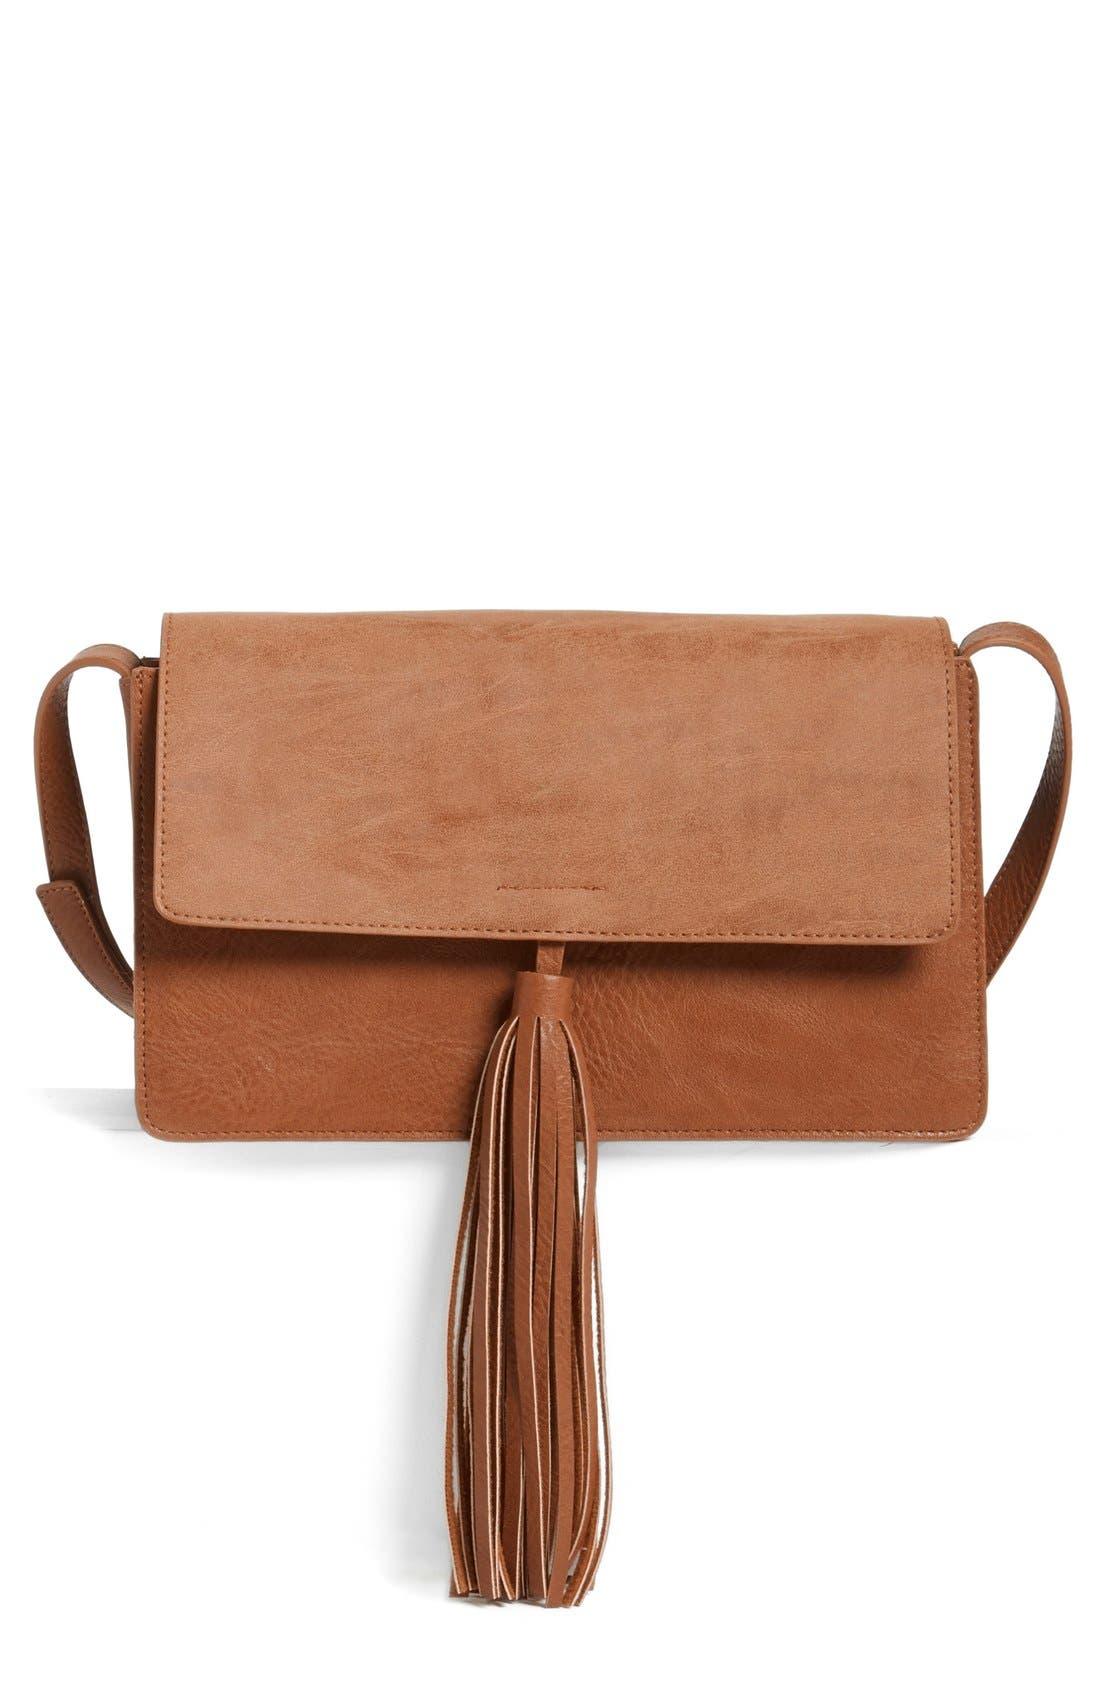 Alternate Image 1 Selected - BP. Tassel Faux Leather Crossbody Bag